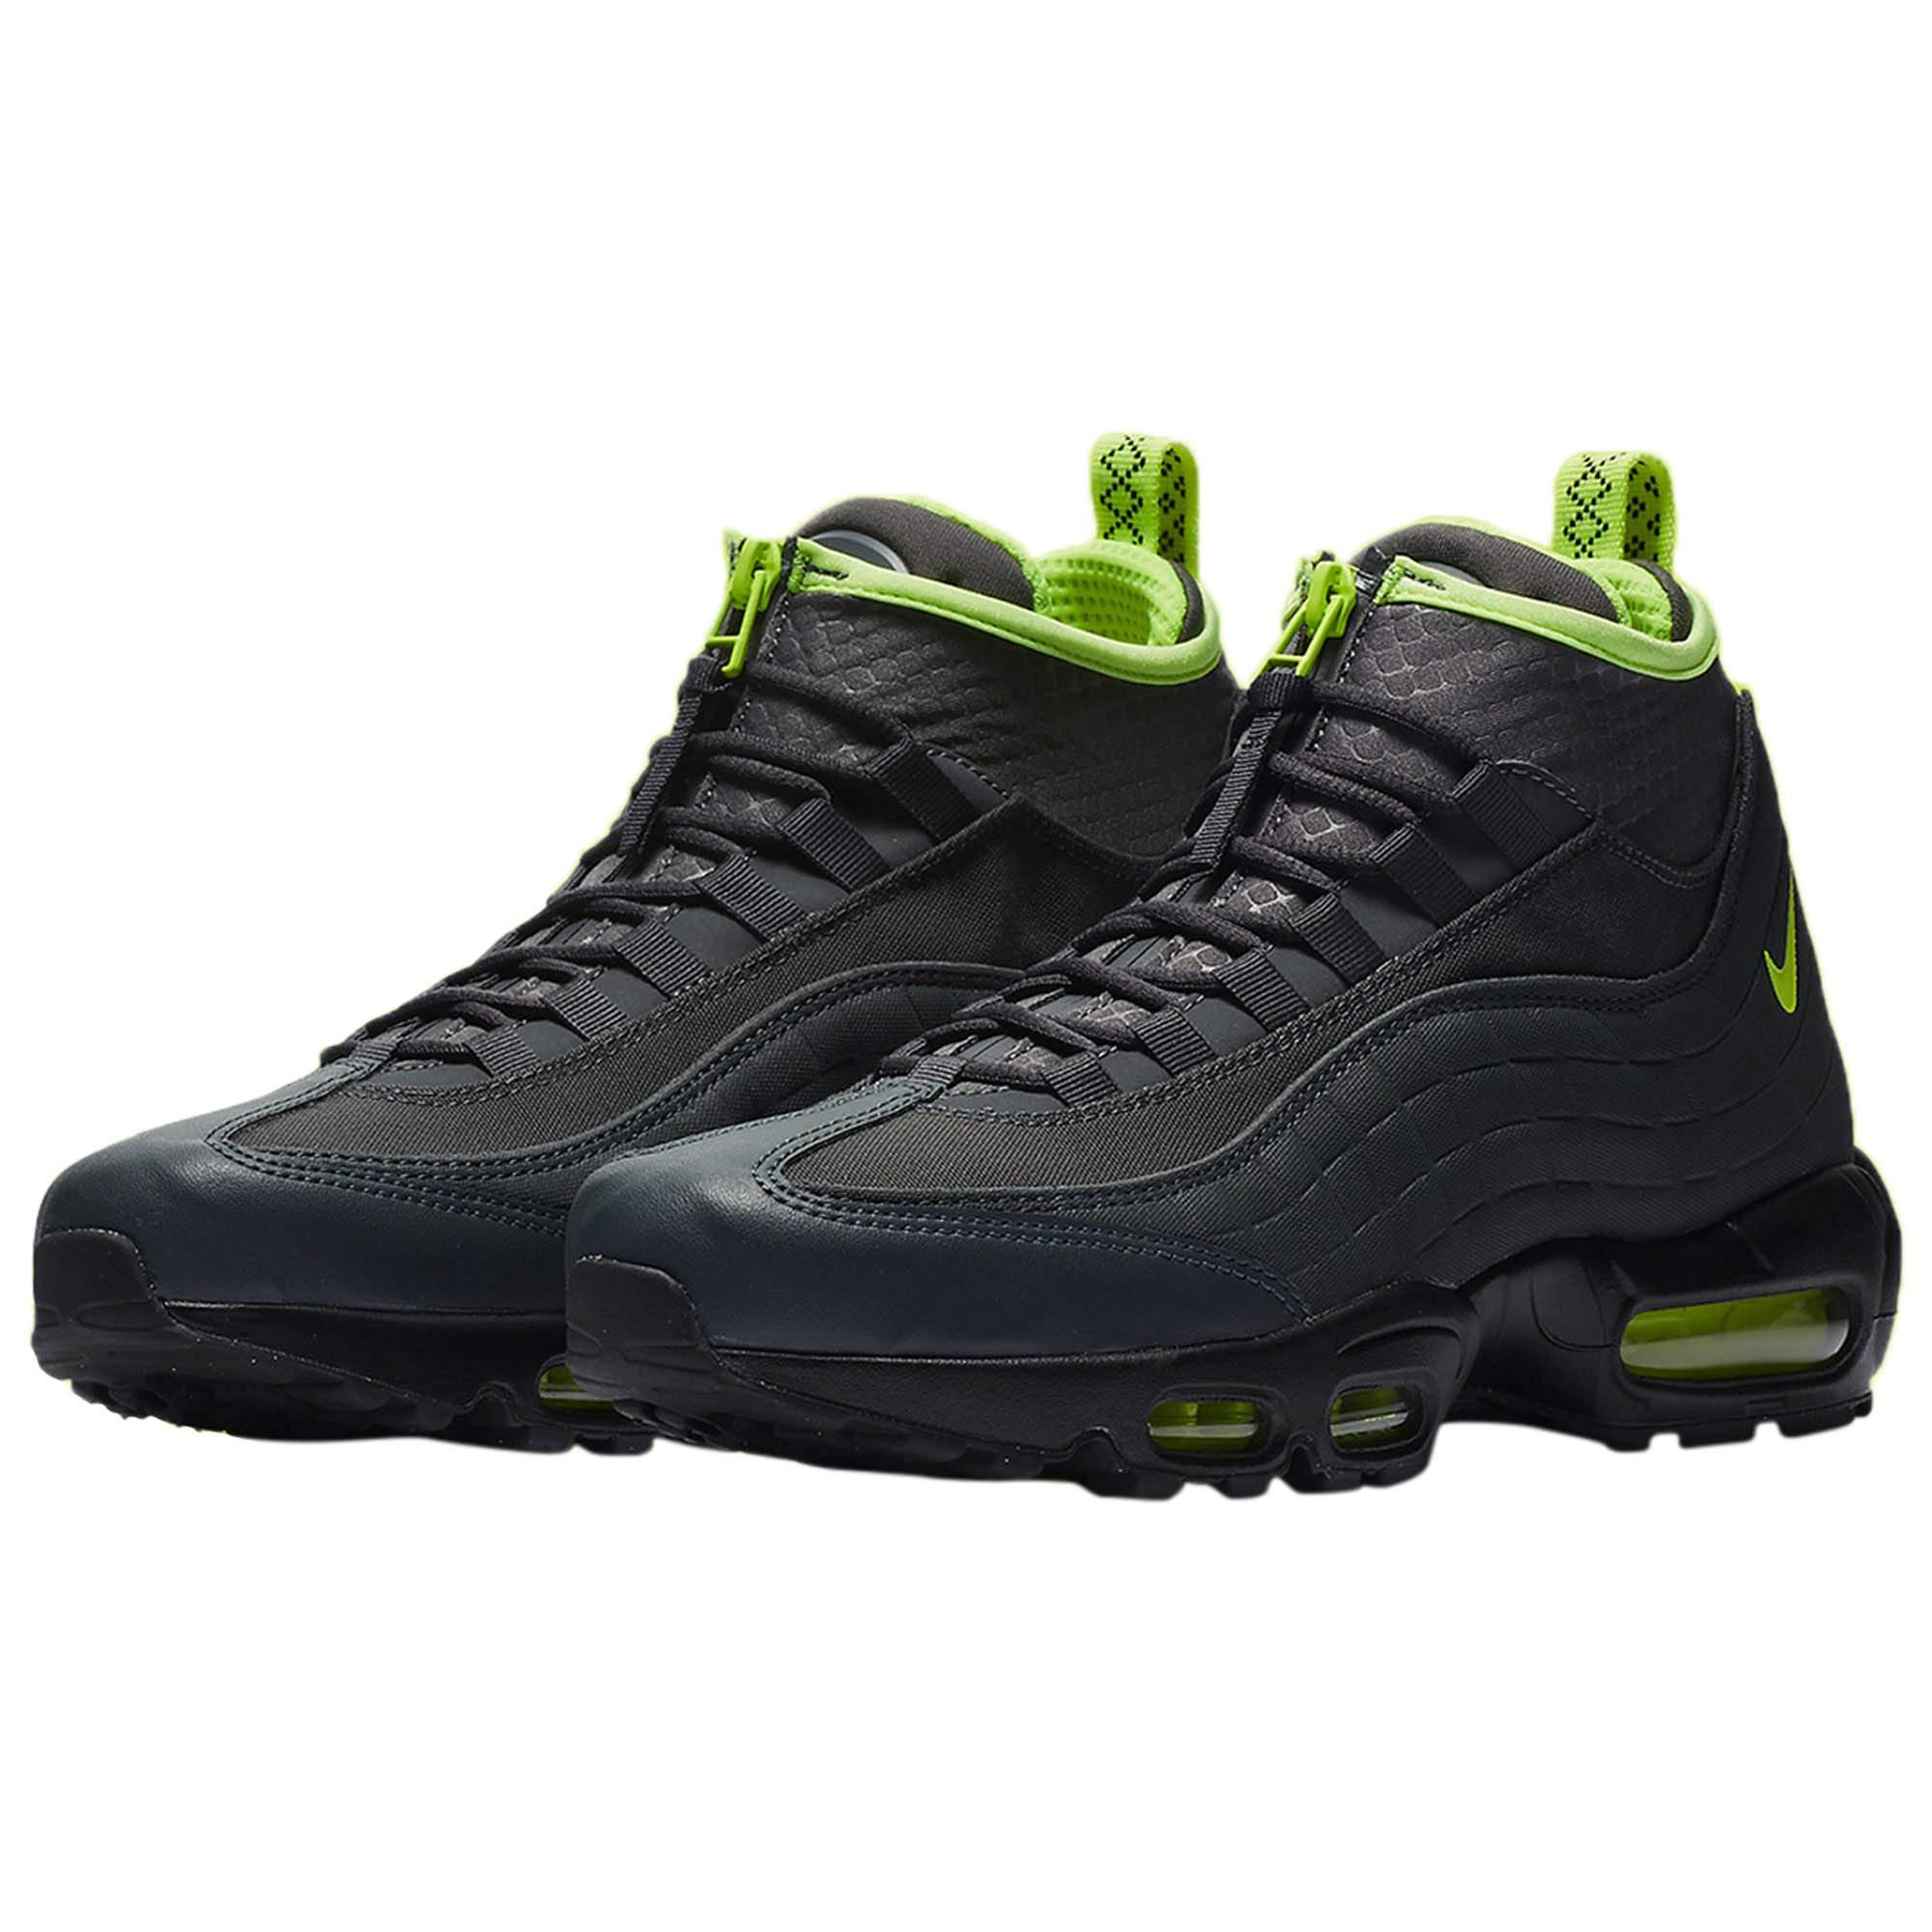 cc0e148611 Galleon - Nike 806809-003: Men's Air Max 95 Anthracite/Volt/Dark Grey-Black  Sneaker (10 D(M) US Men)